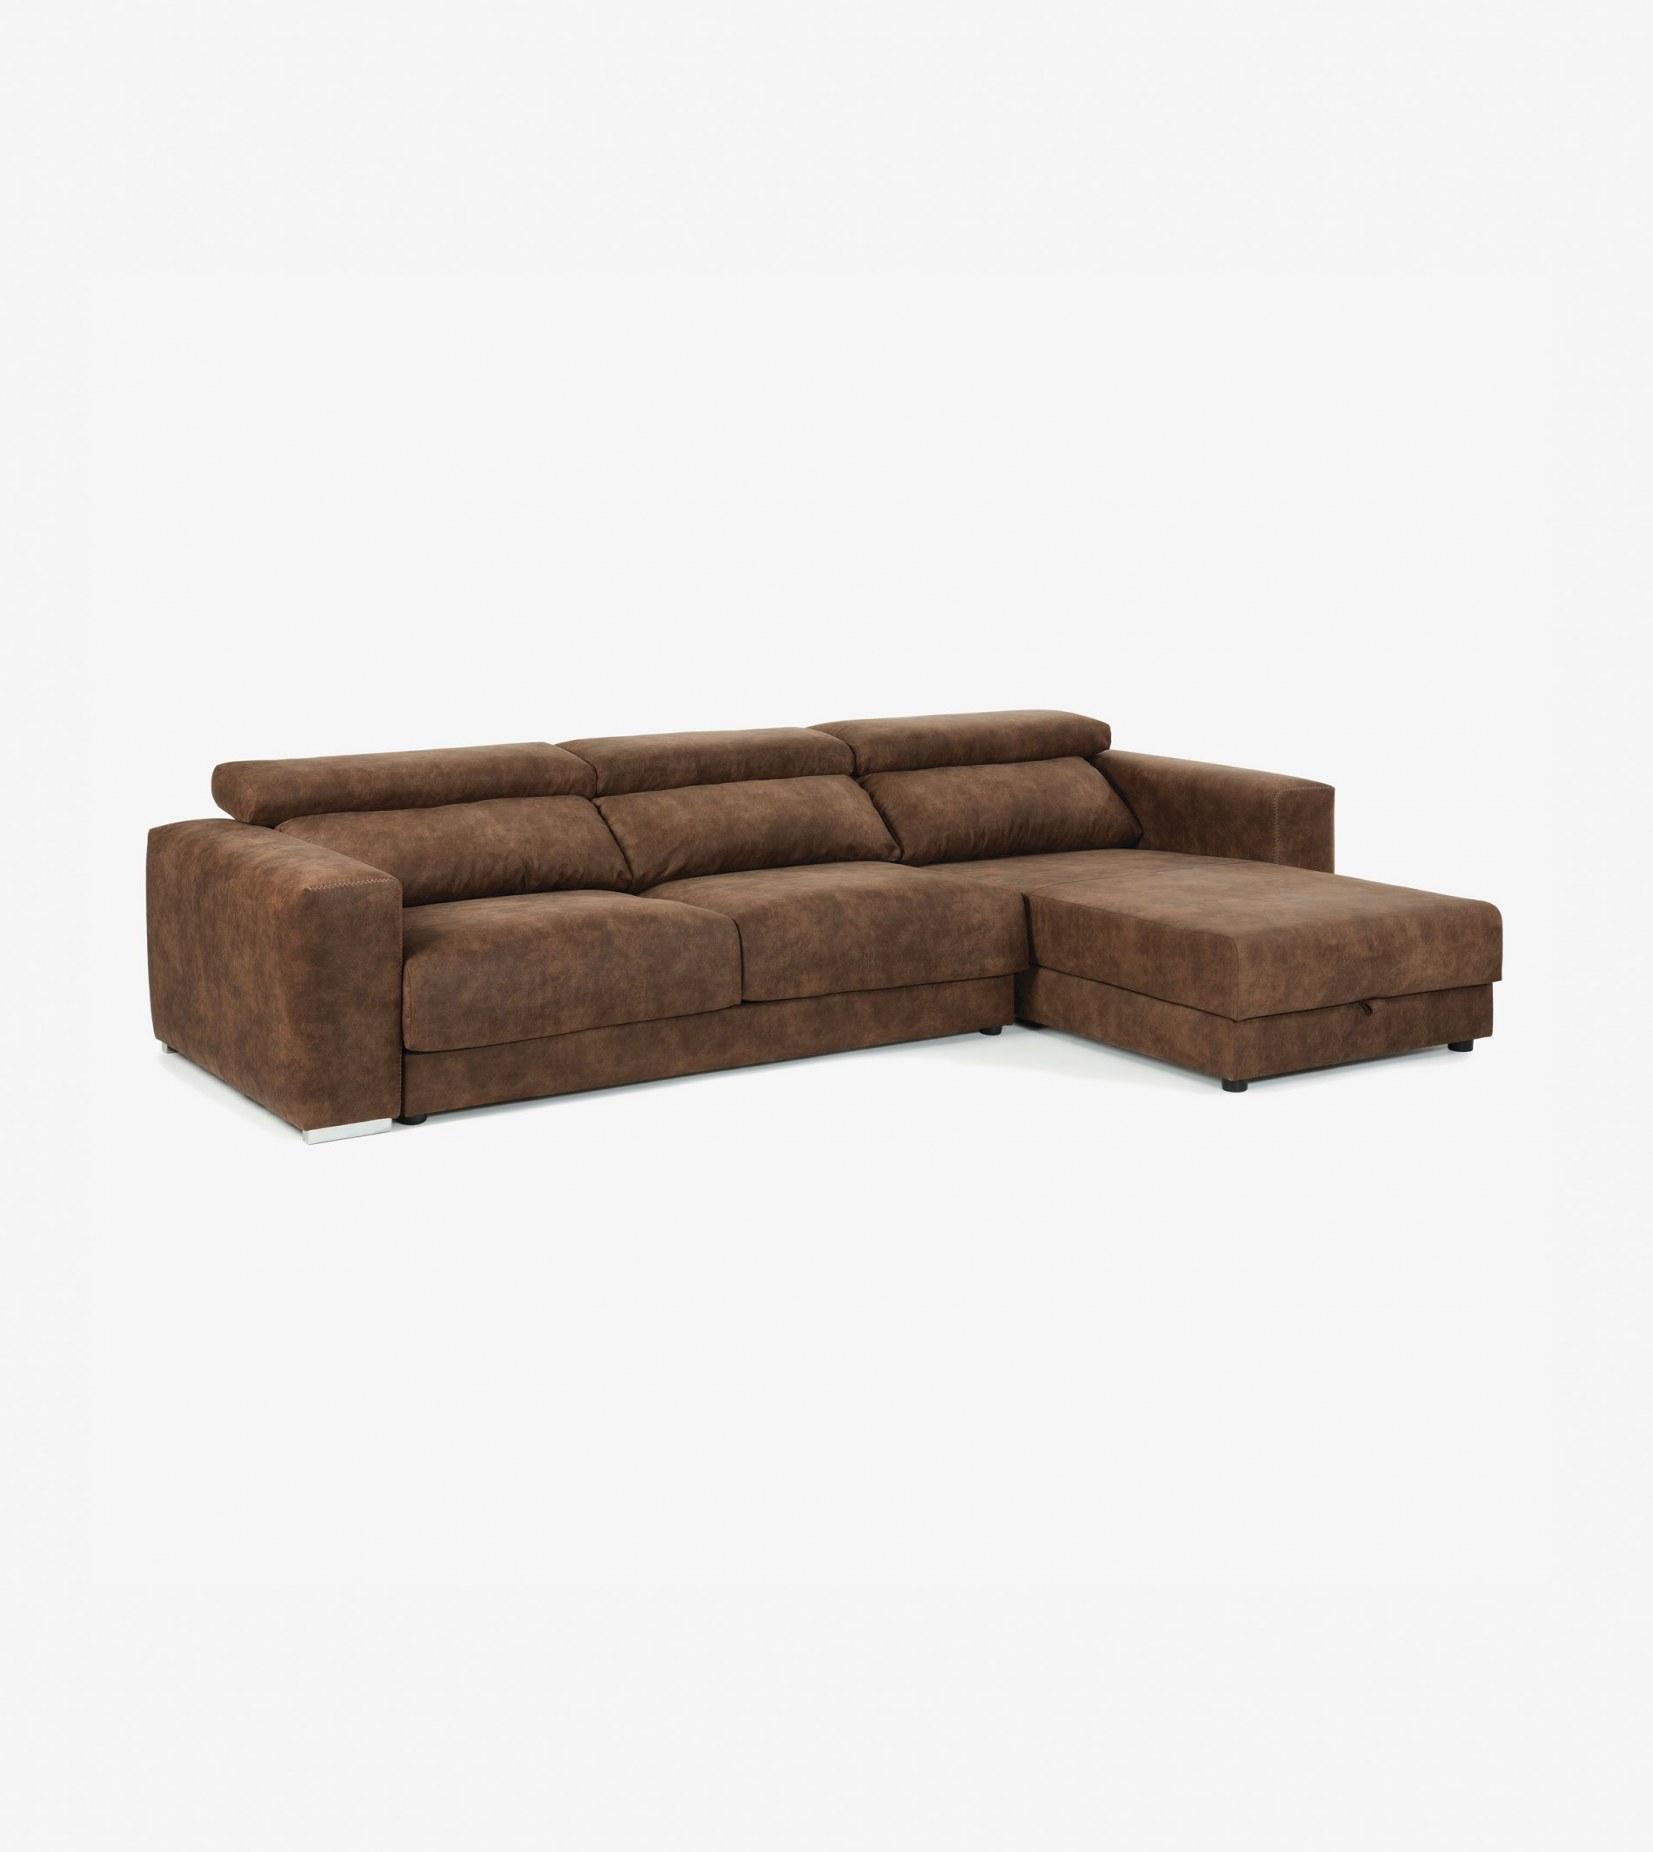 tan leather sofa atlanta 3 seater sofa with chaise longue rust brown of tan leather sofa